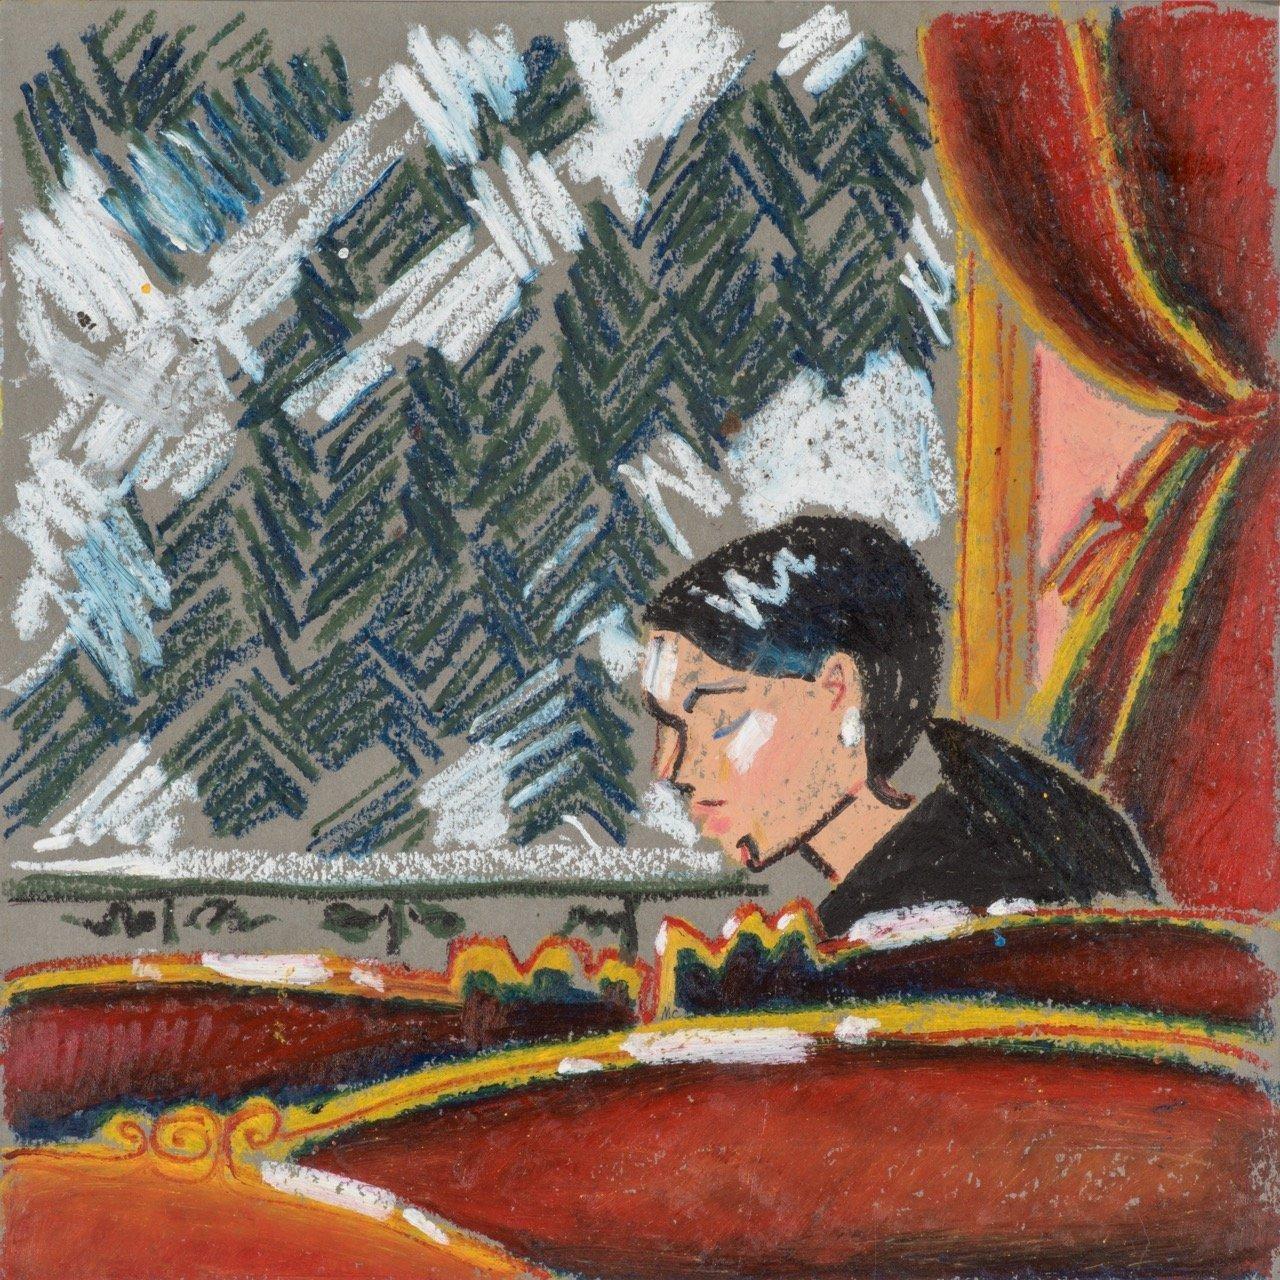 Mary Cinque – A Winter's Tale